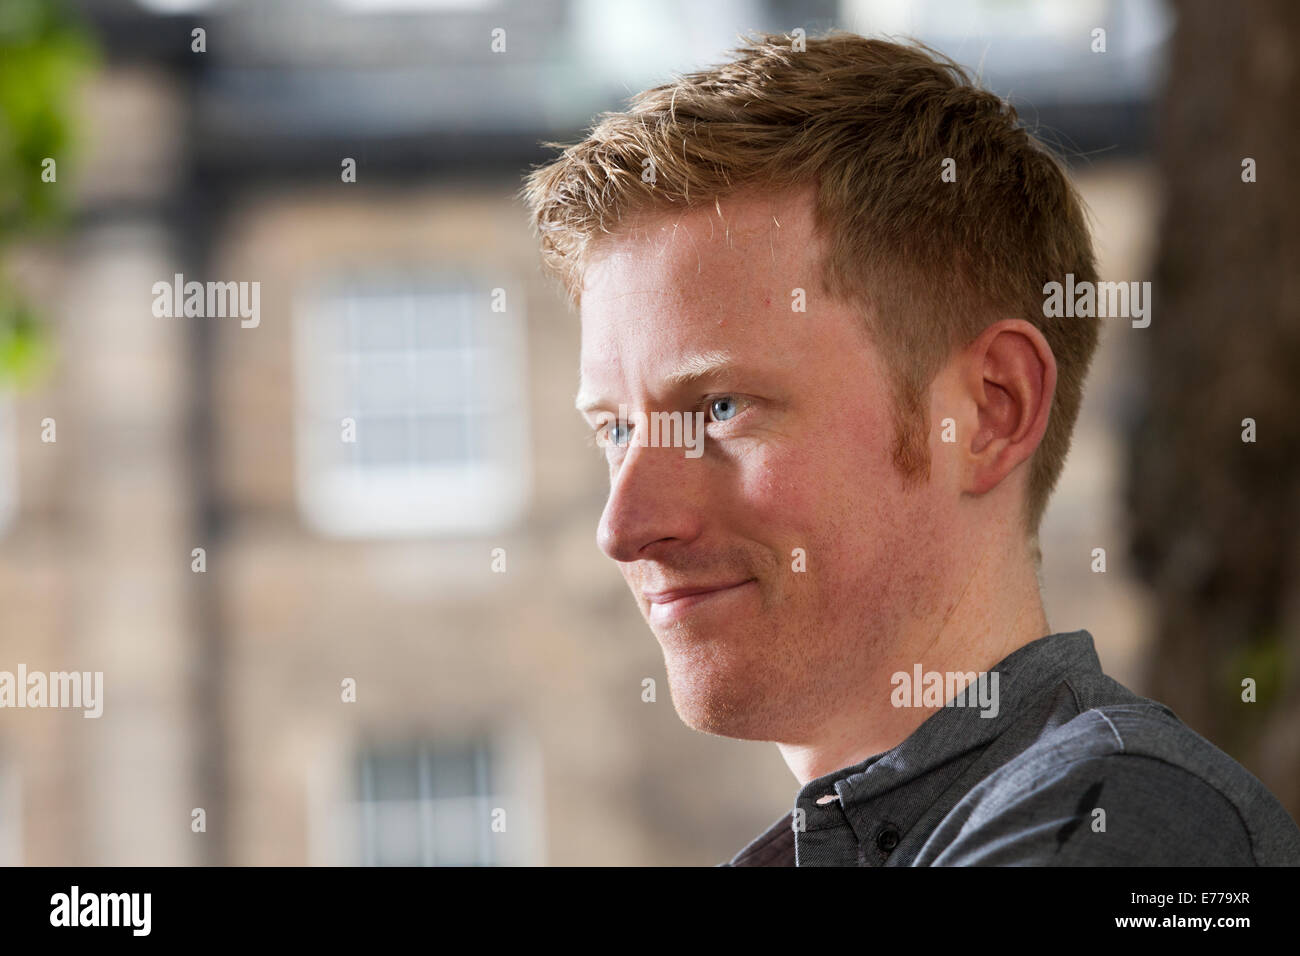 Colin Barrett, author, at the Edinburgh International Book Festival 2014. Edinburgh, Scotland. 10th August 2014 - Stock Image